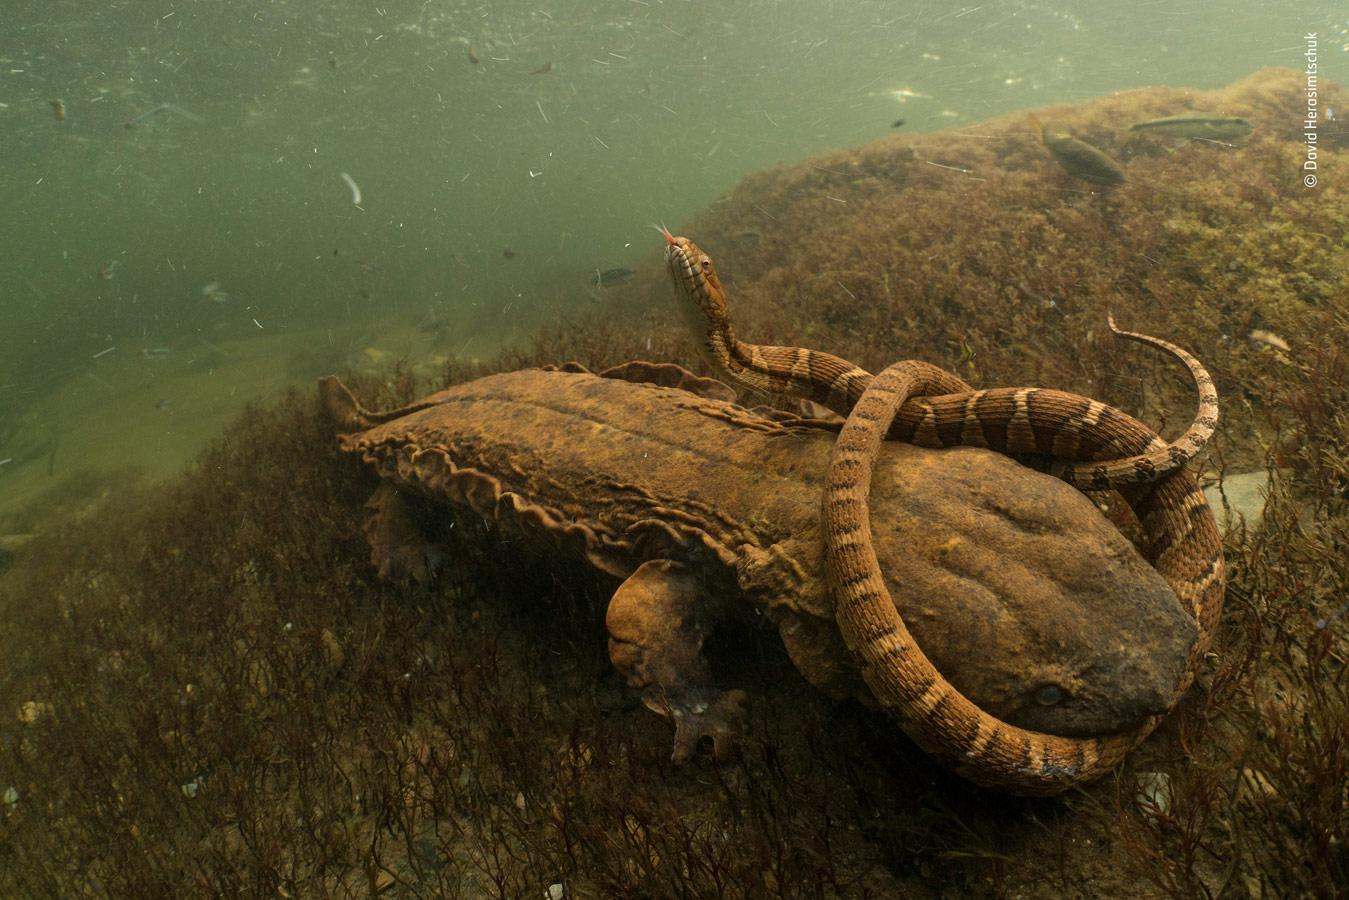 Behaviours Amphibians and Reptiles Category Winner, Hellbent, © David Herasimtschuk, USA, Wildlife Photographer of the Year